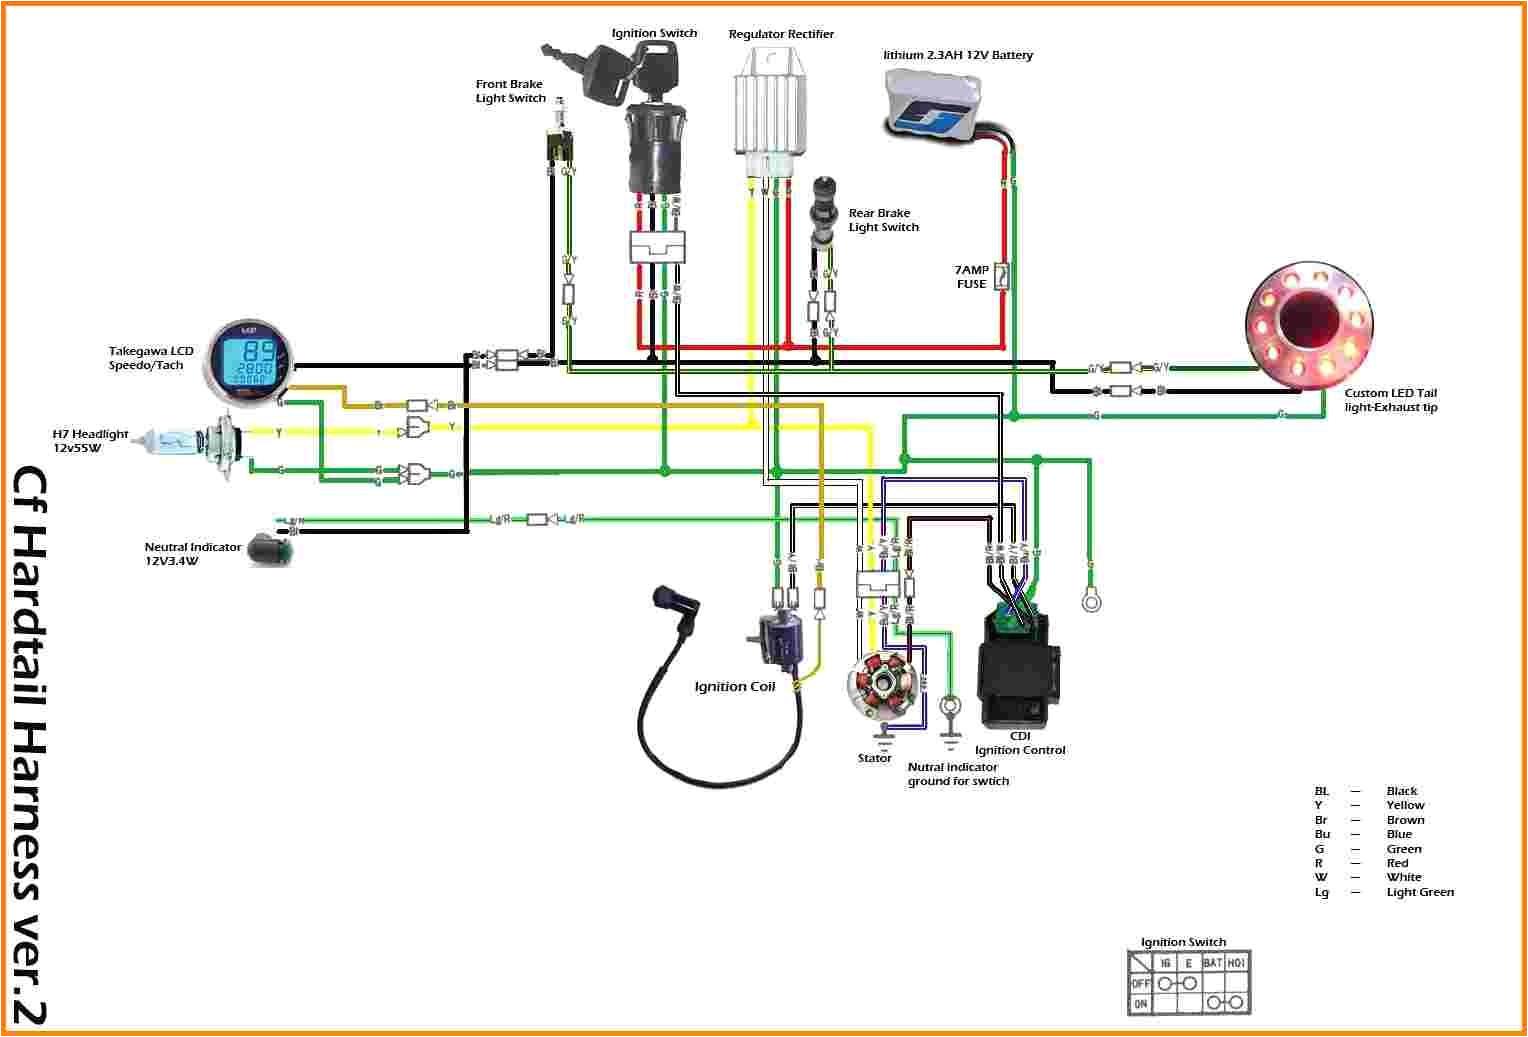 harley mini chopper 49cc scooter wiring diagram wiring diagram view 49cc chinese engine wiring diagram